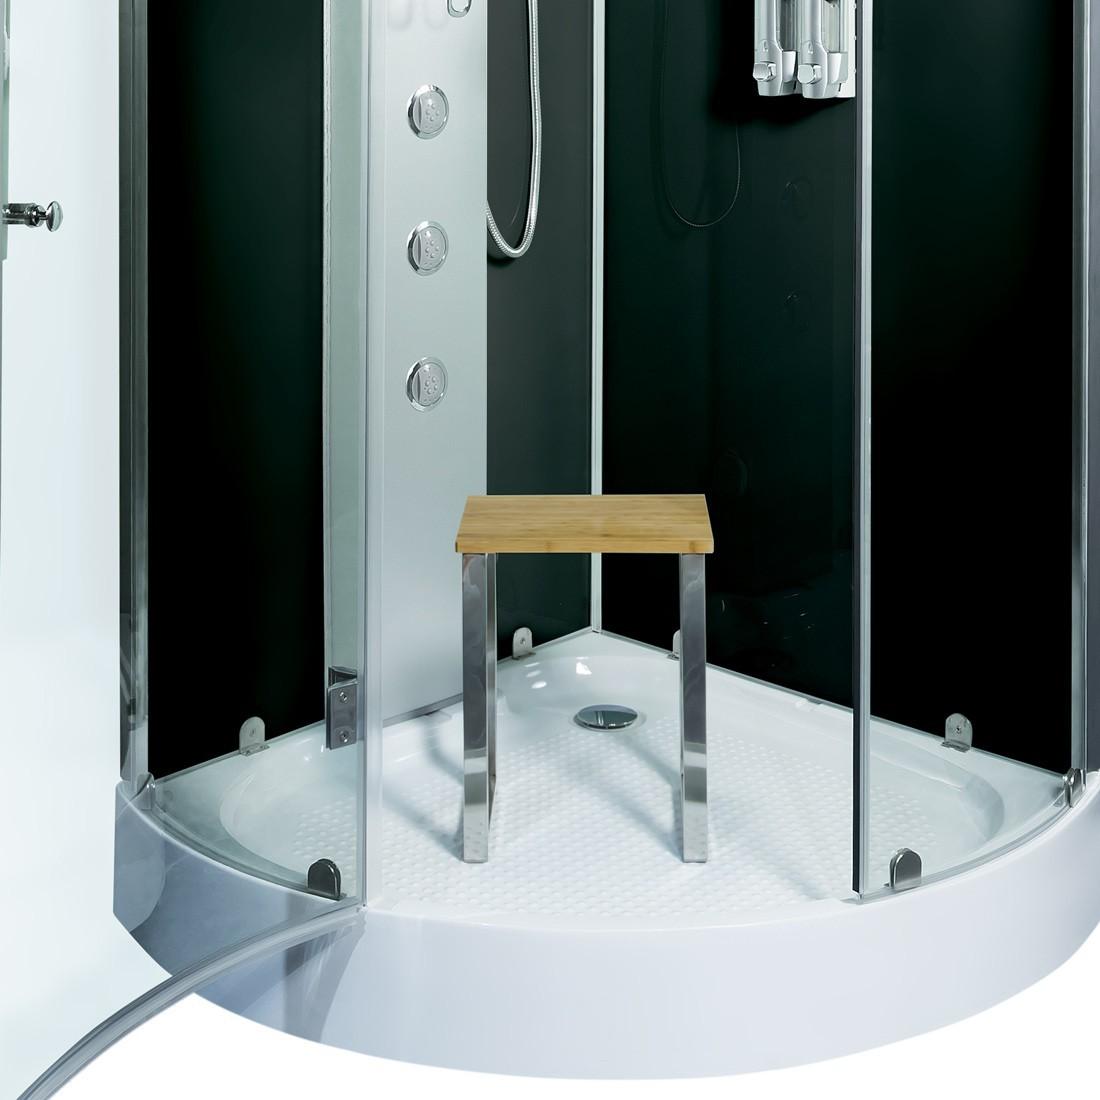 acquavapore dtp6037 0301 dusche duschtempel komplett duschkabine th 80x80. Black Bedroom Furniture Sets. Home Design Ideas